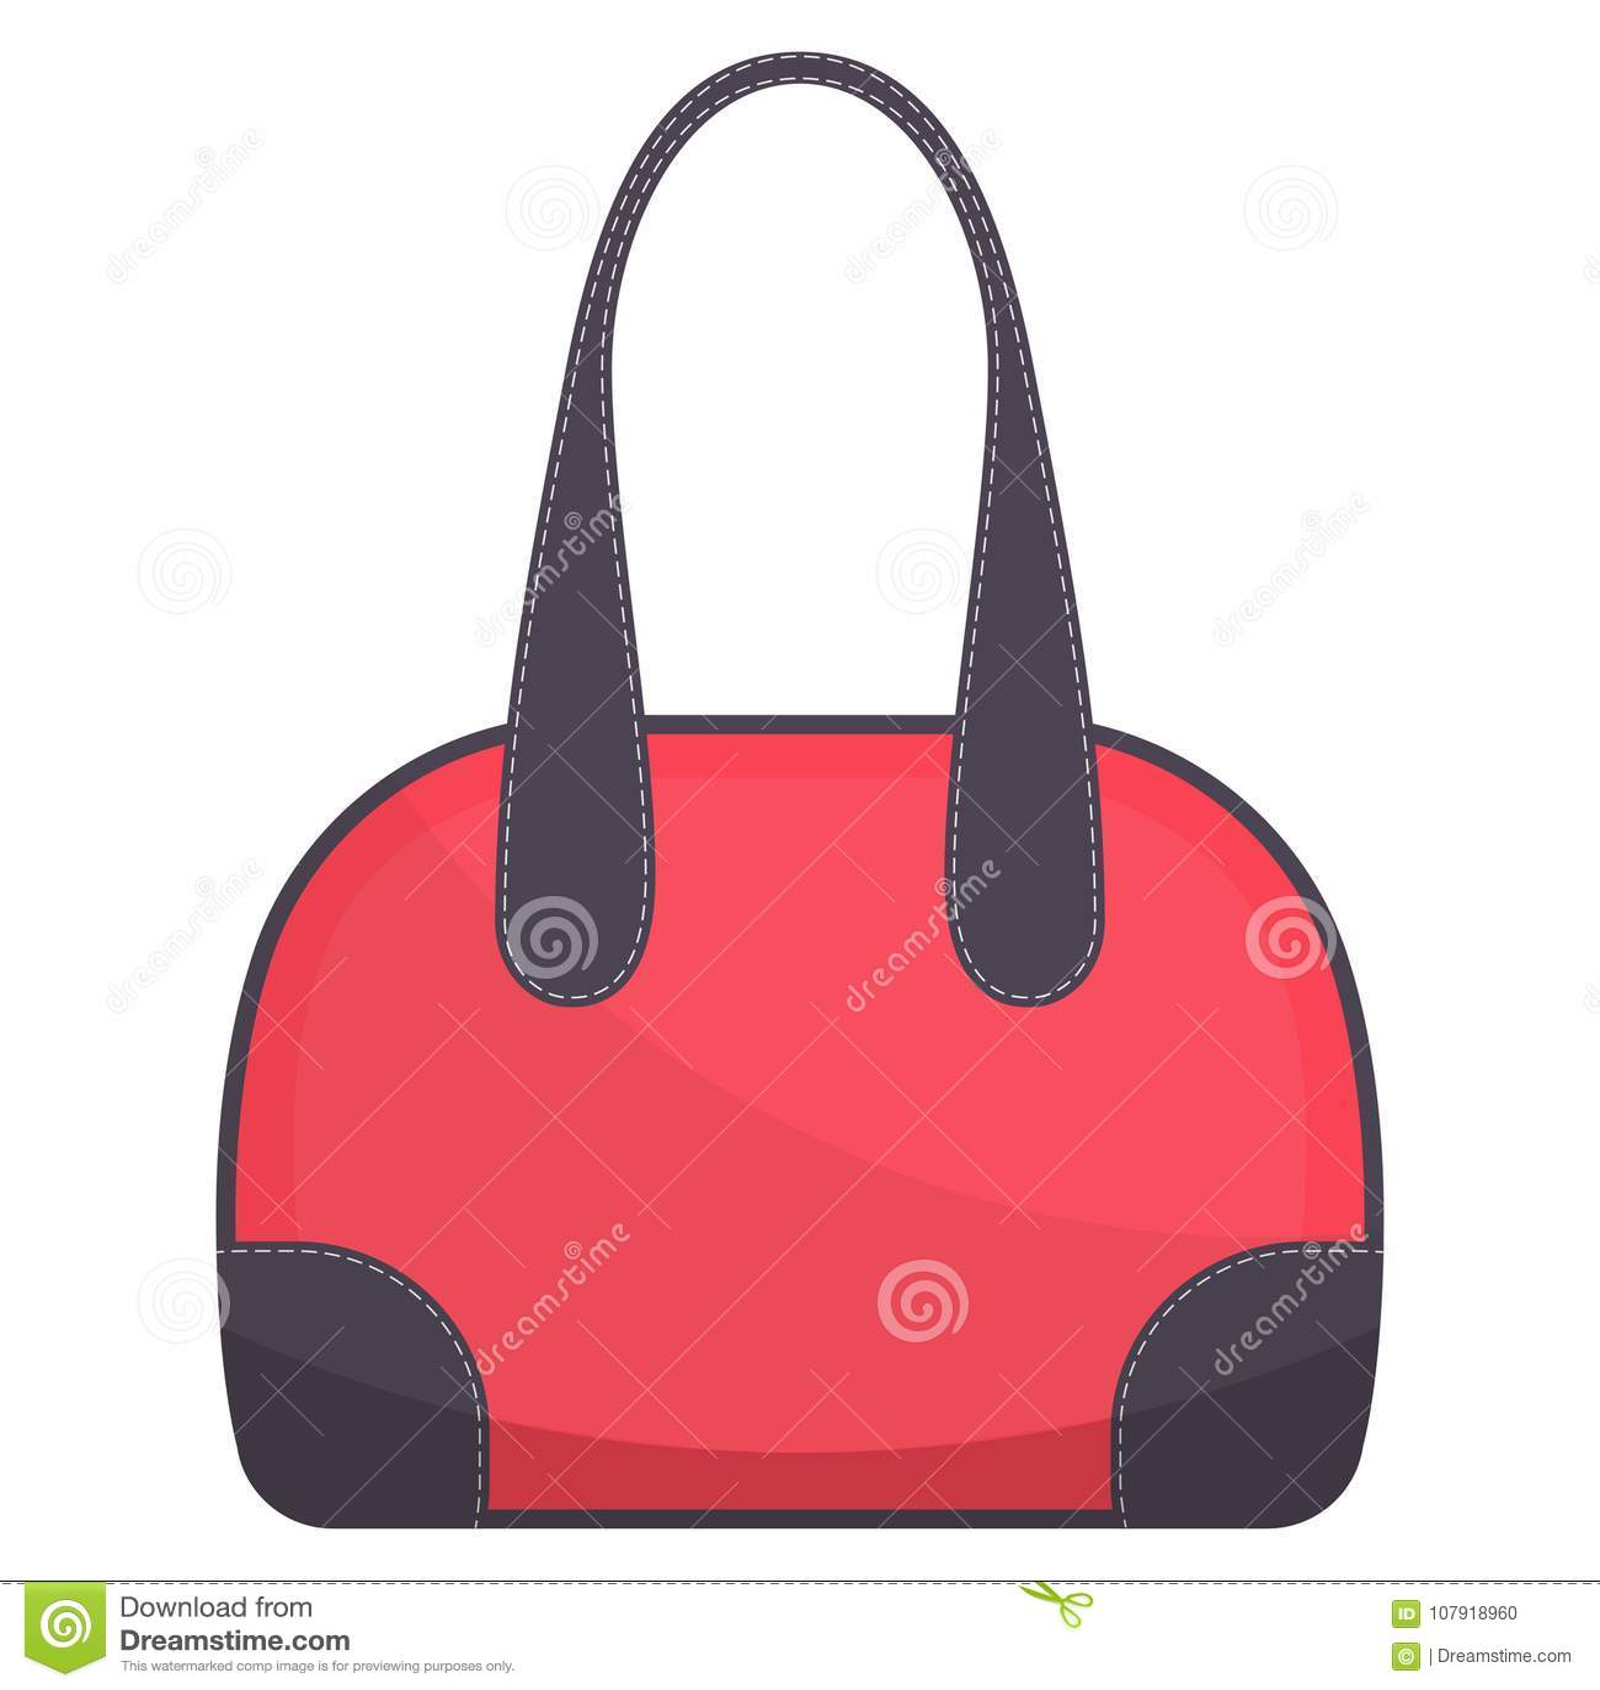 94222008ef Colorful handbag with white stitching. Woman bag. Ladies handbag isolated  on white background. Vector illustration.